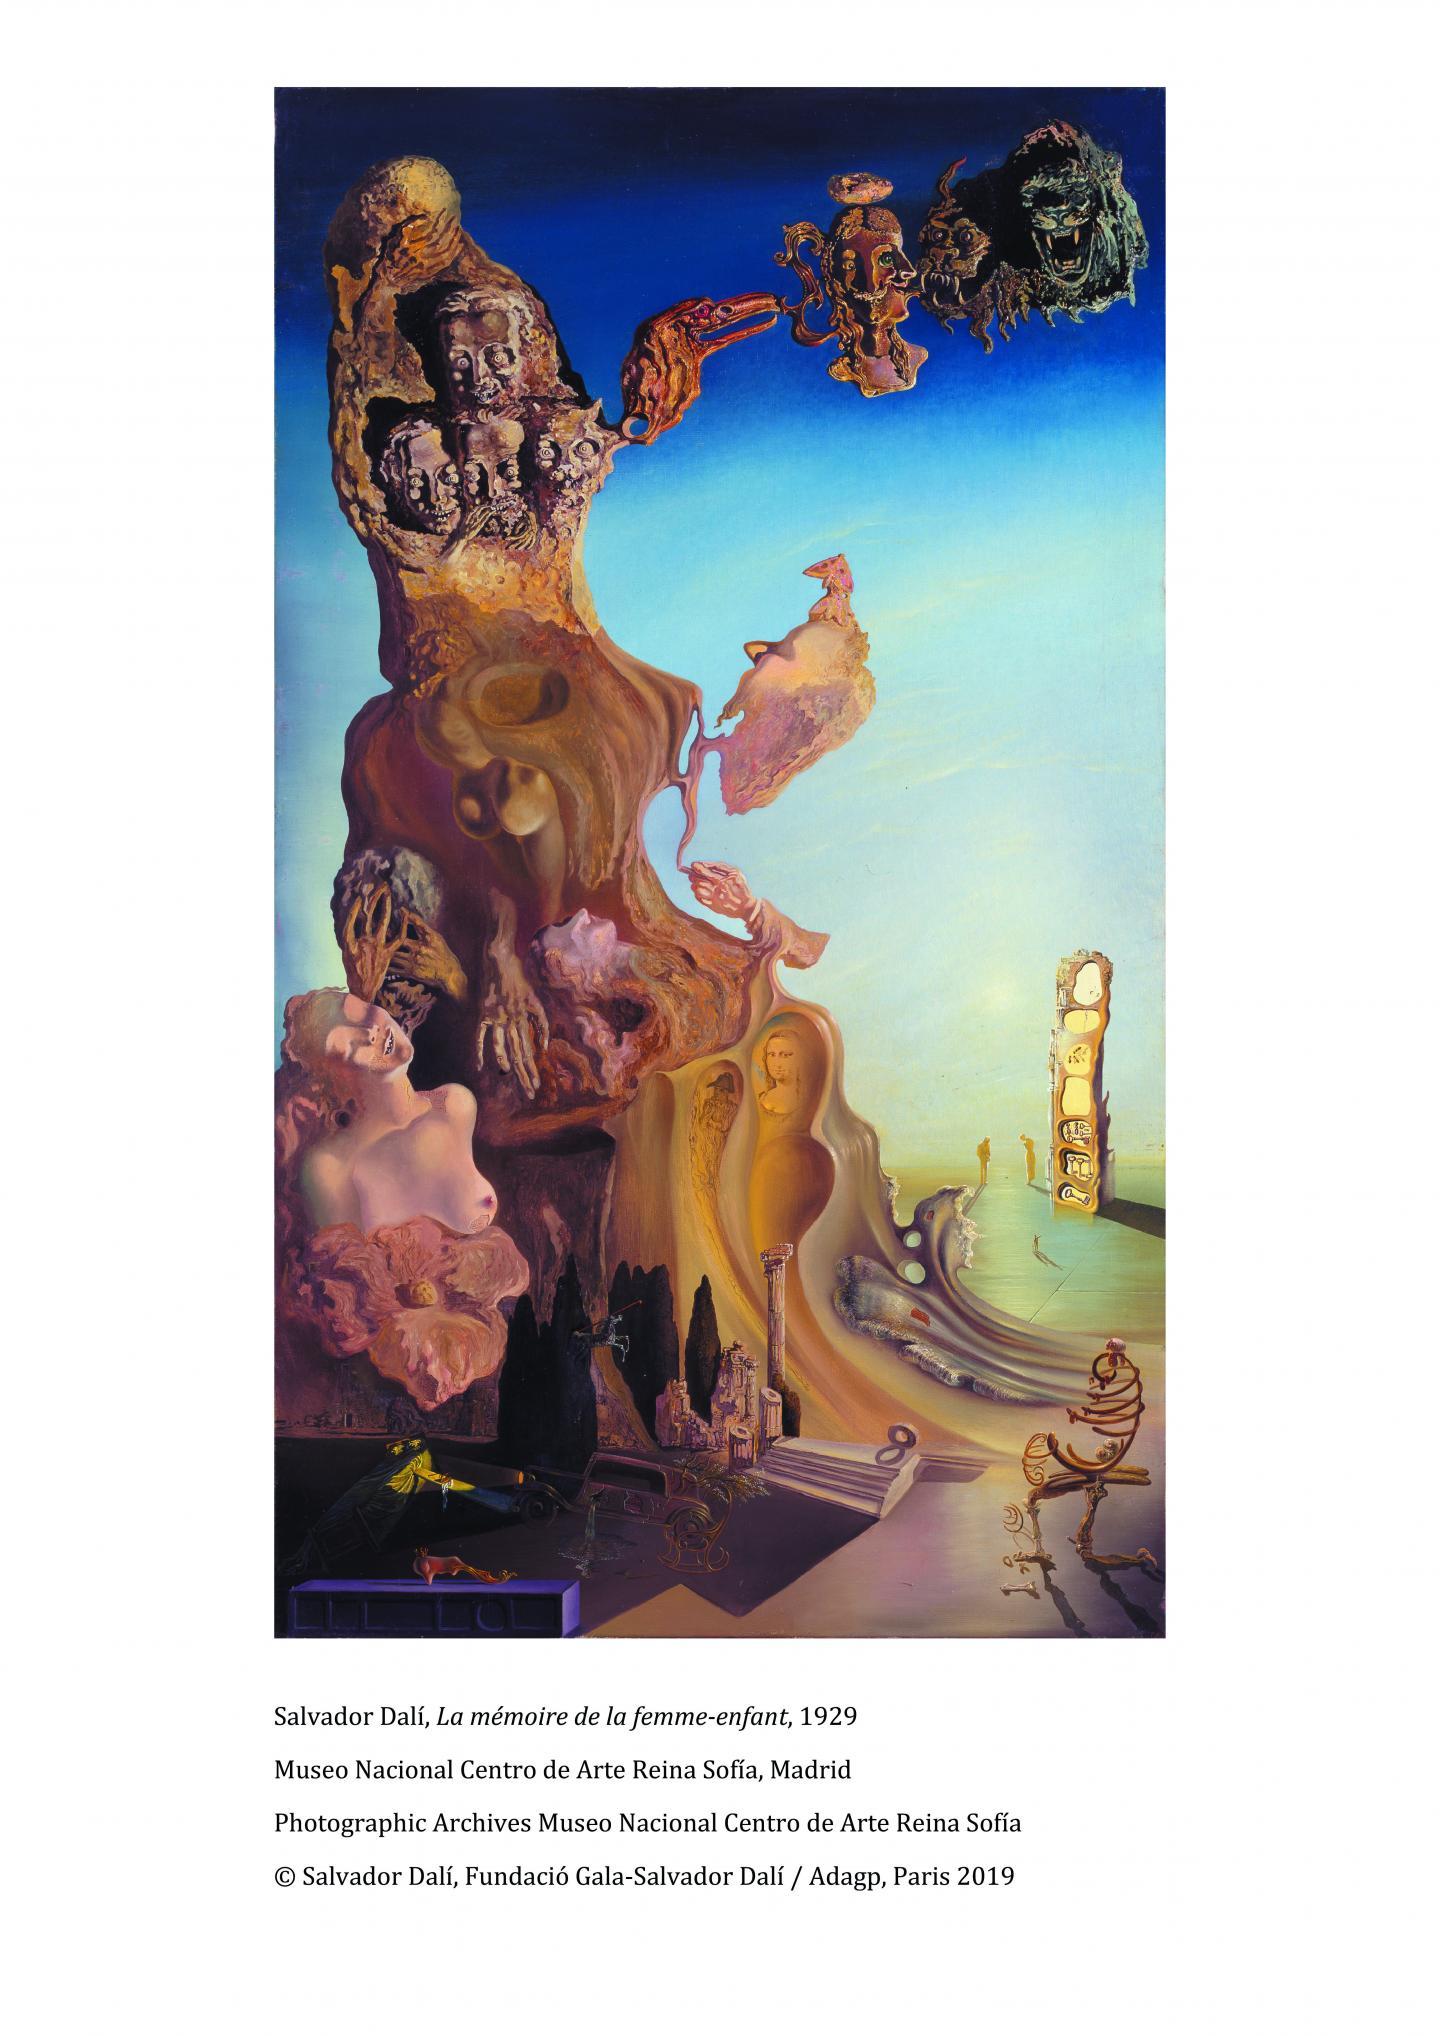 La mémoire de la femme enfant. (Reproduction Salvador Dali Fundacio Gala-Salvador Dali)